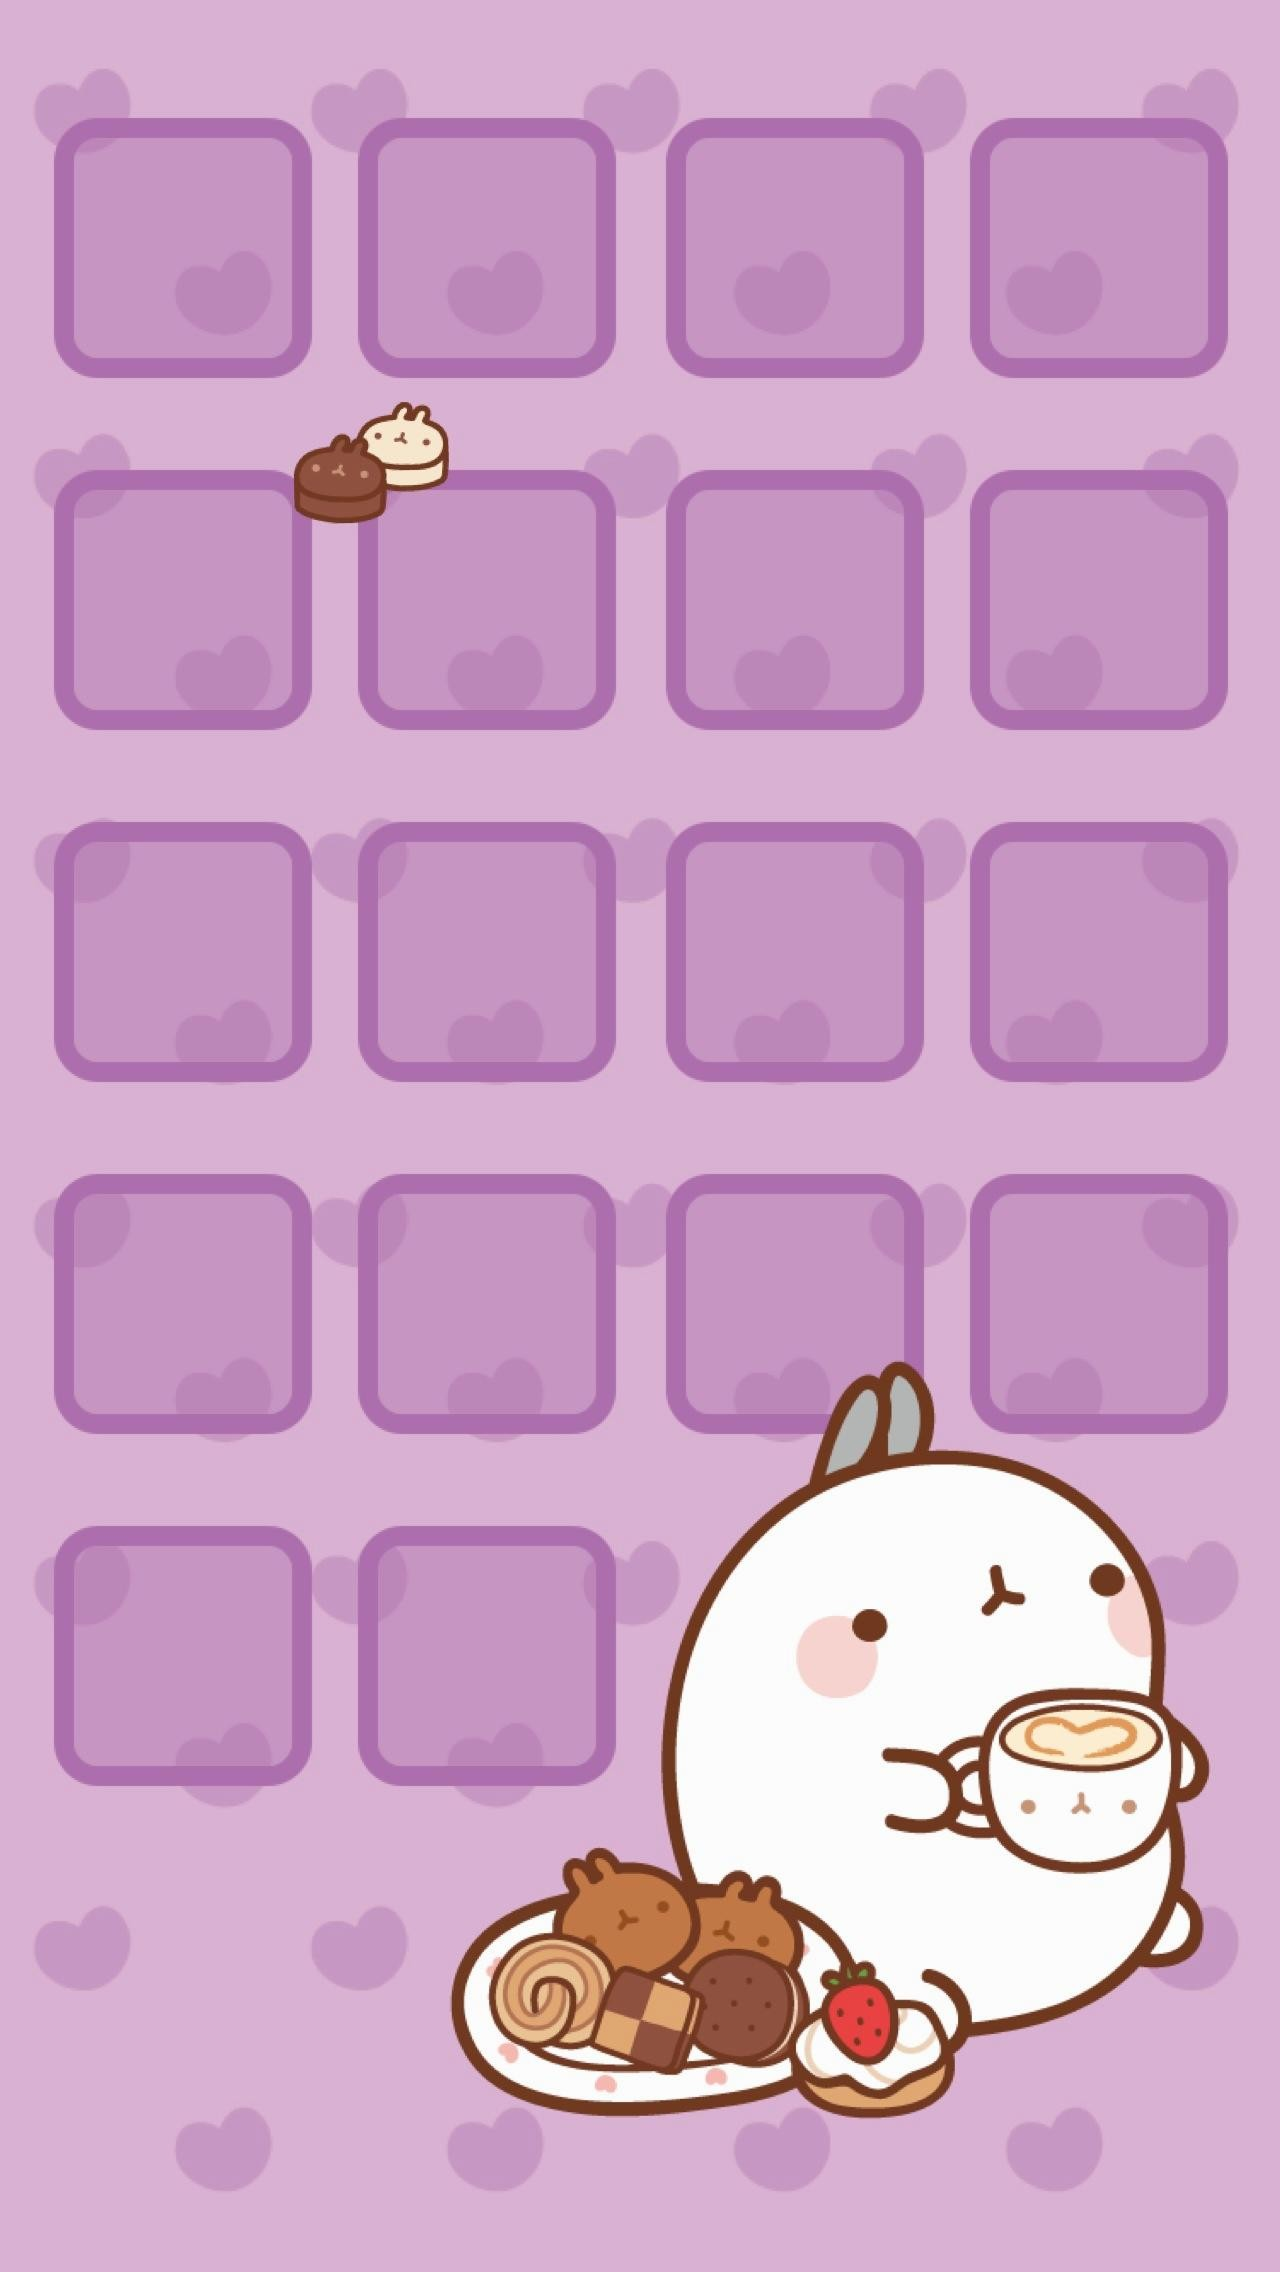 wallpaper.wiki-Kawaii-iPhone-Wallpapers-PIC-WPC00472